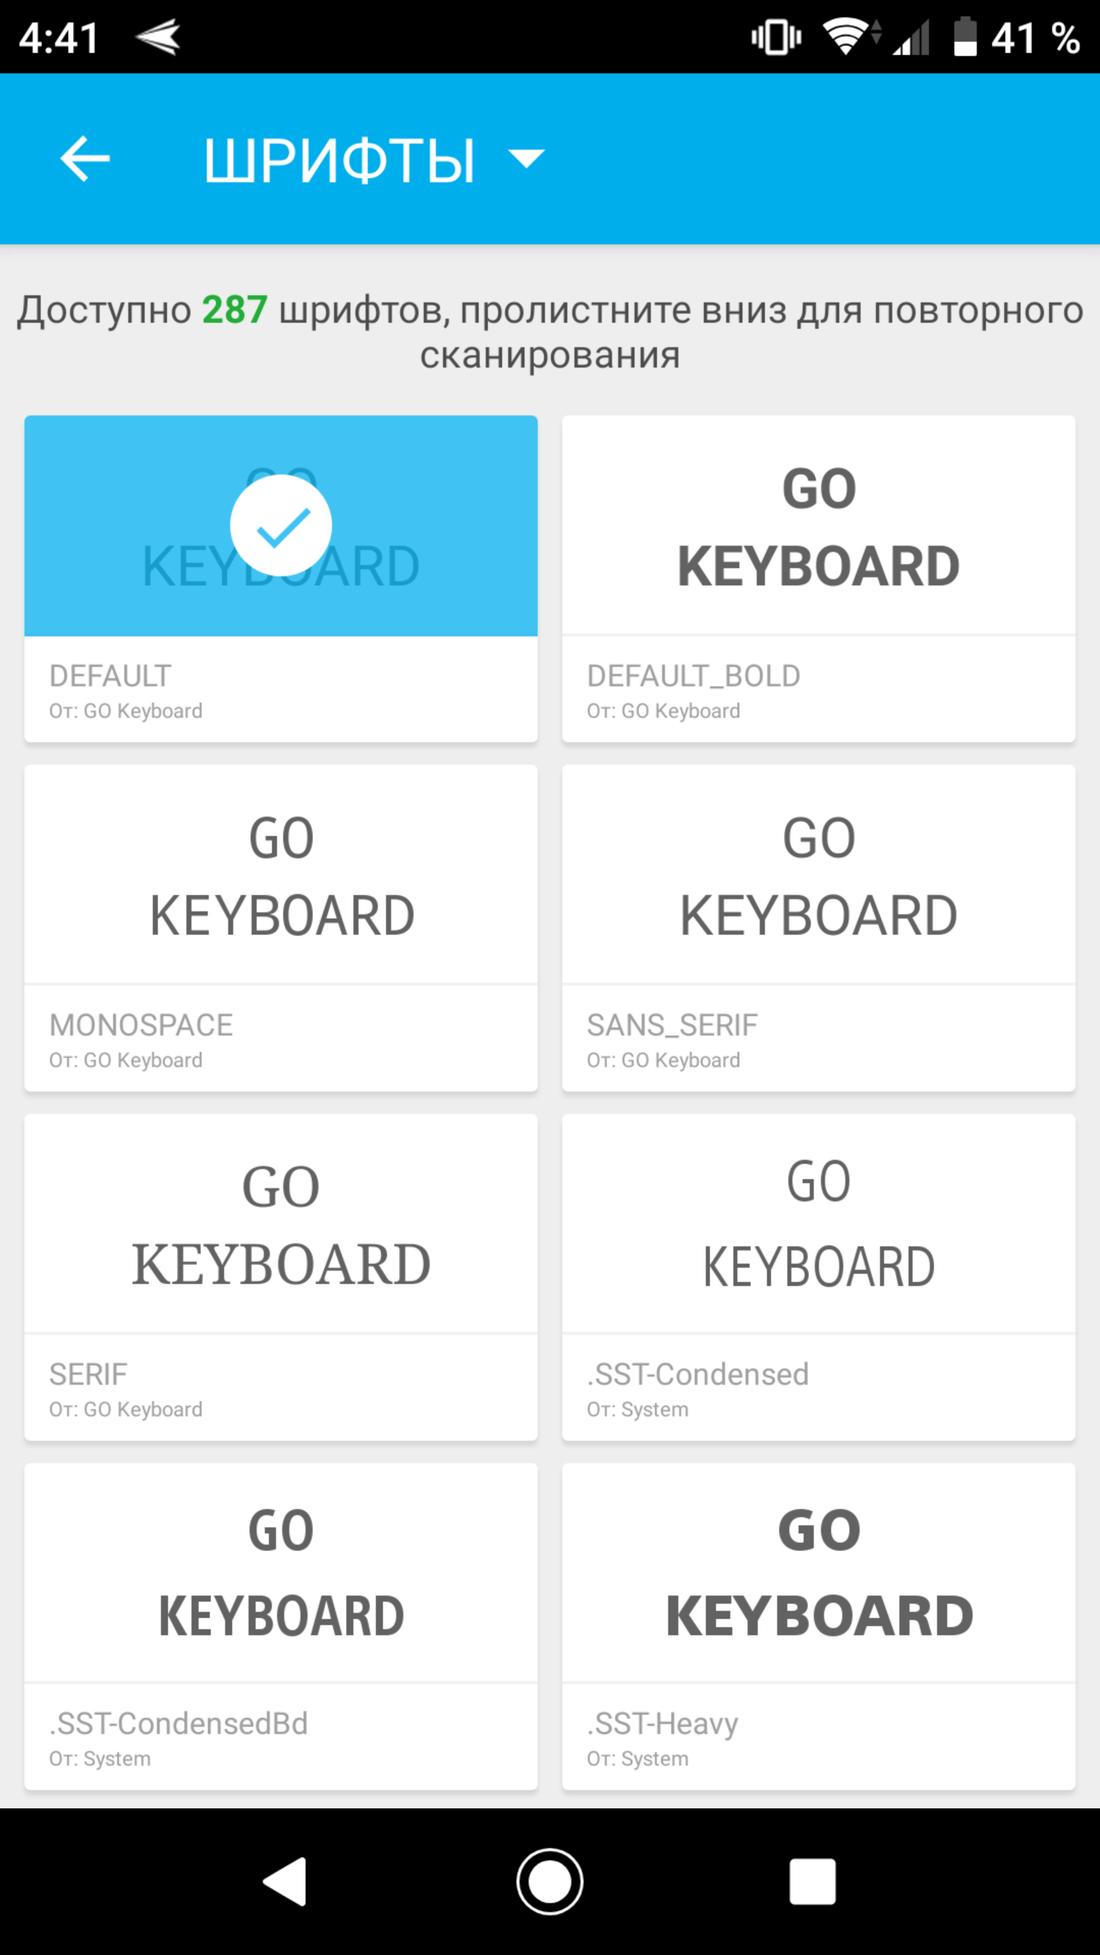 Скриншoт #4 из прoгрaммы GO Keyboard